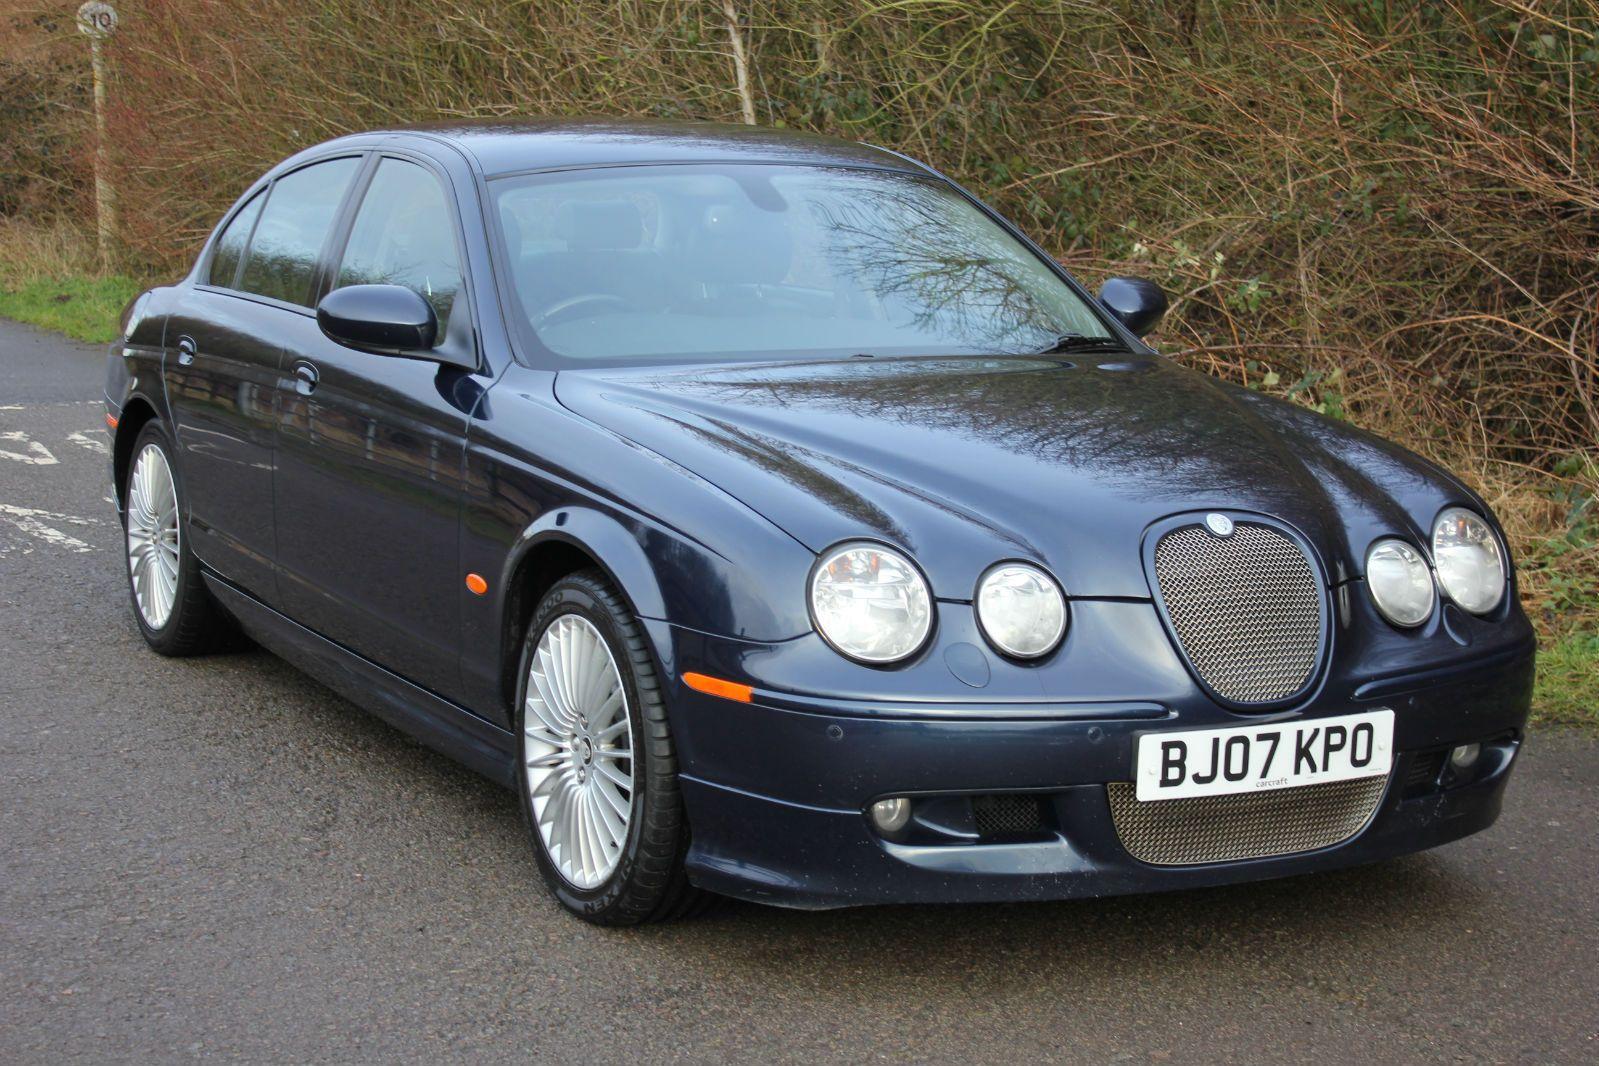 c jaguar s large for of classiccars sale view type washington listings pennsylvania cc jcqc com in picture std